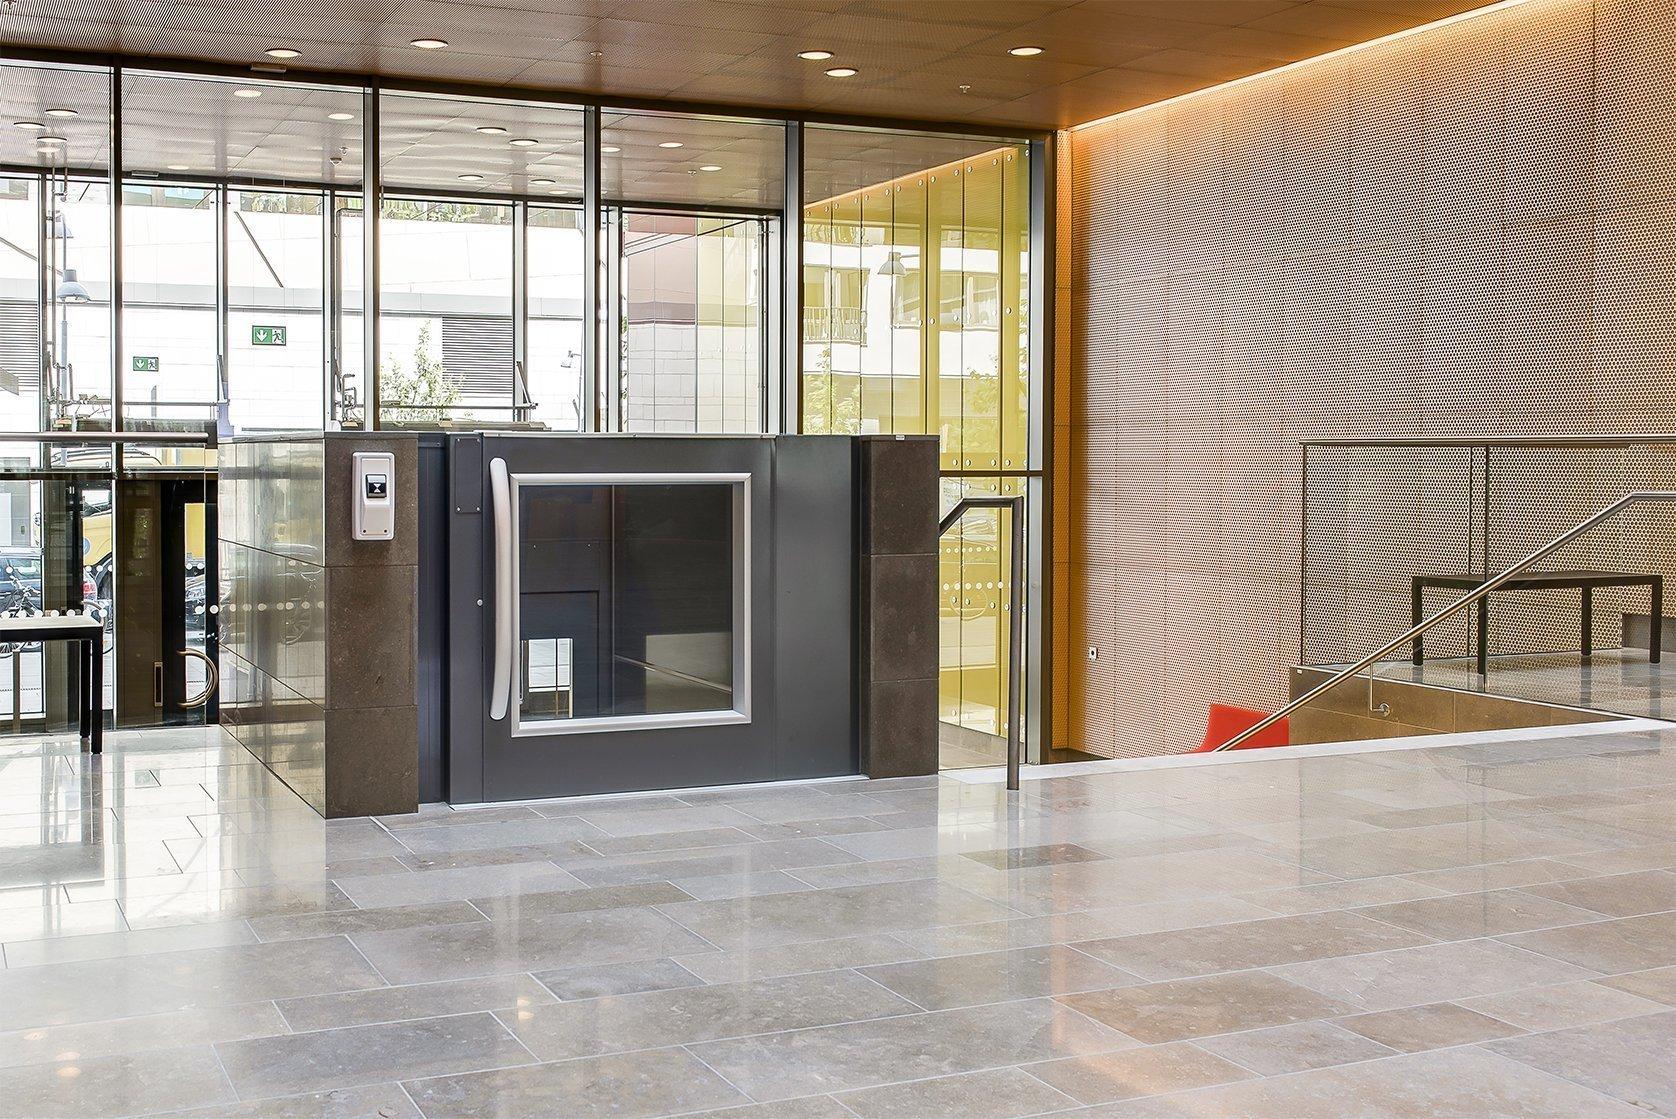 Uarda platform lift, Stockholm